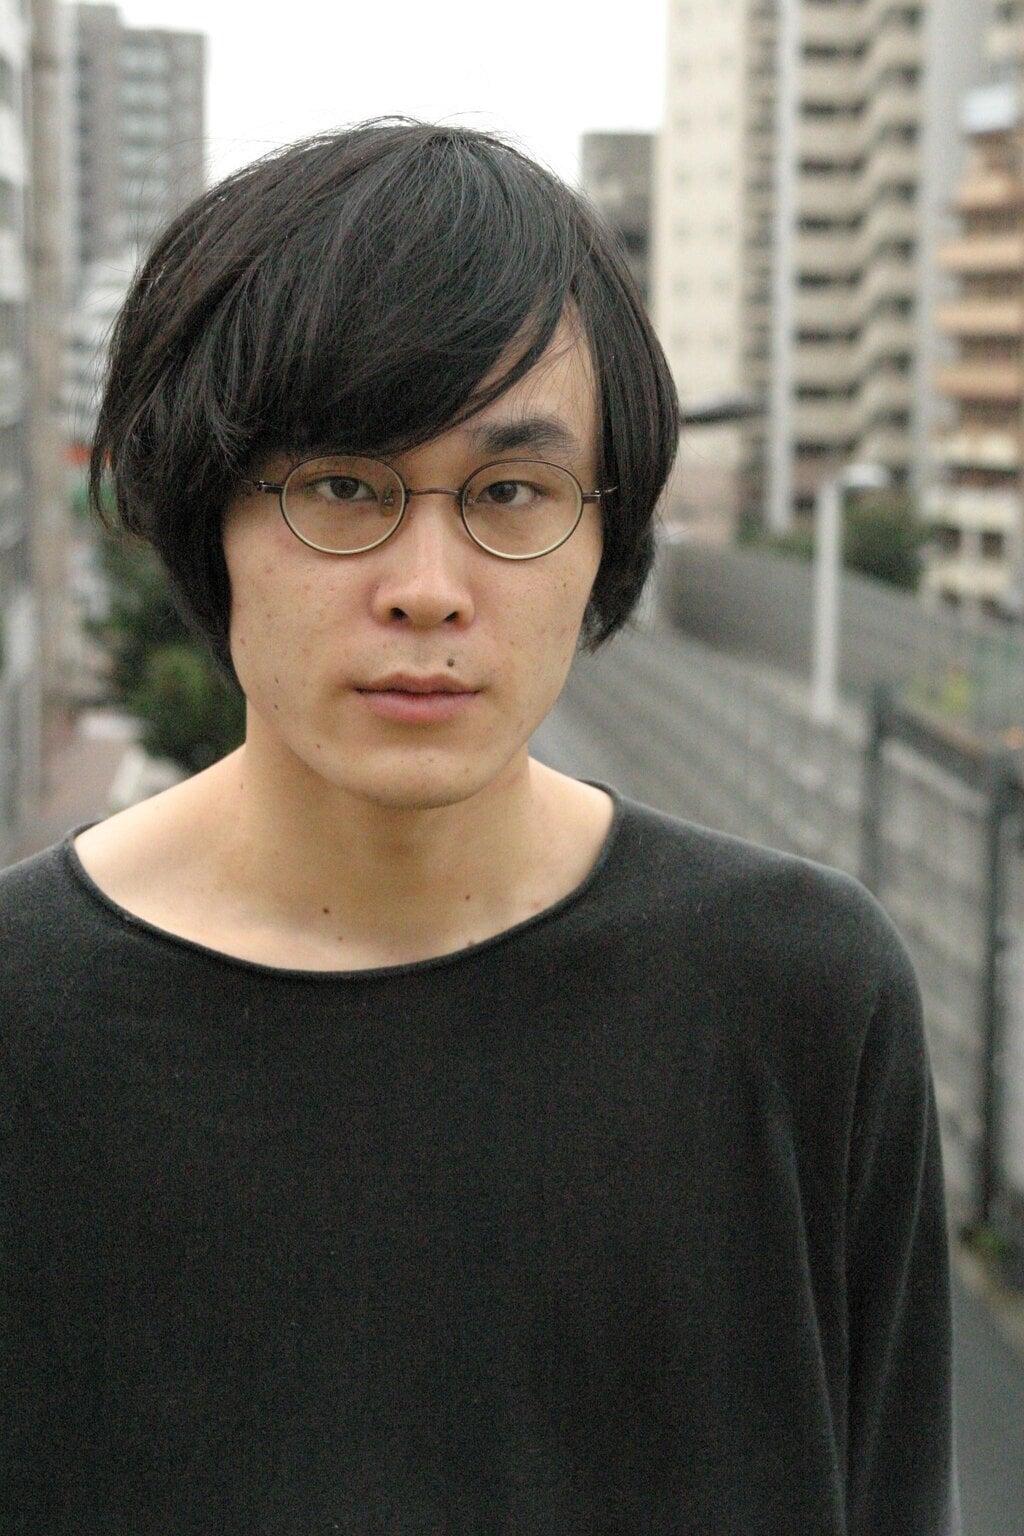 Tomoya Masuda